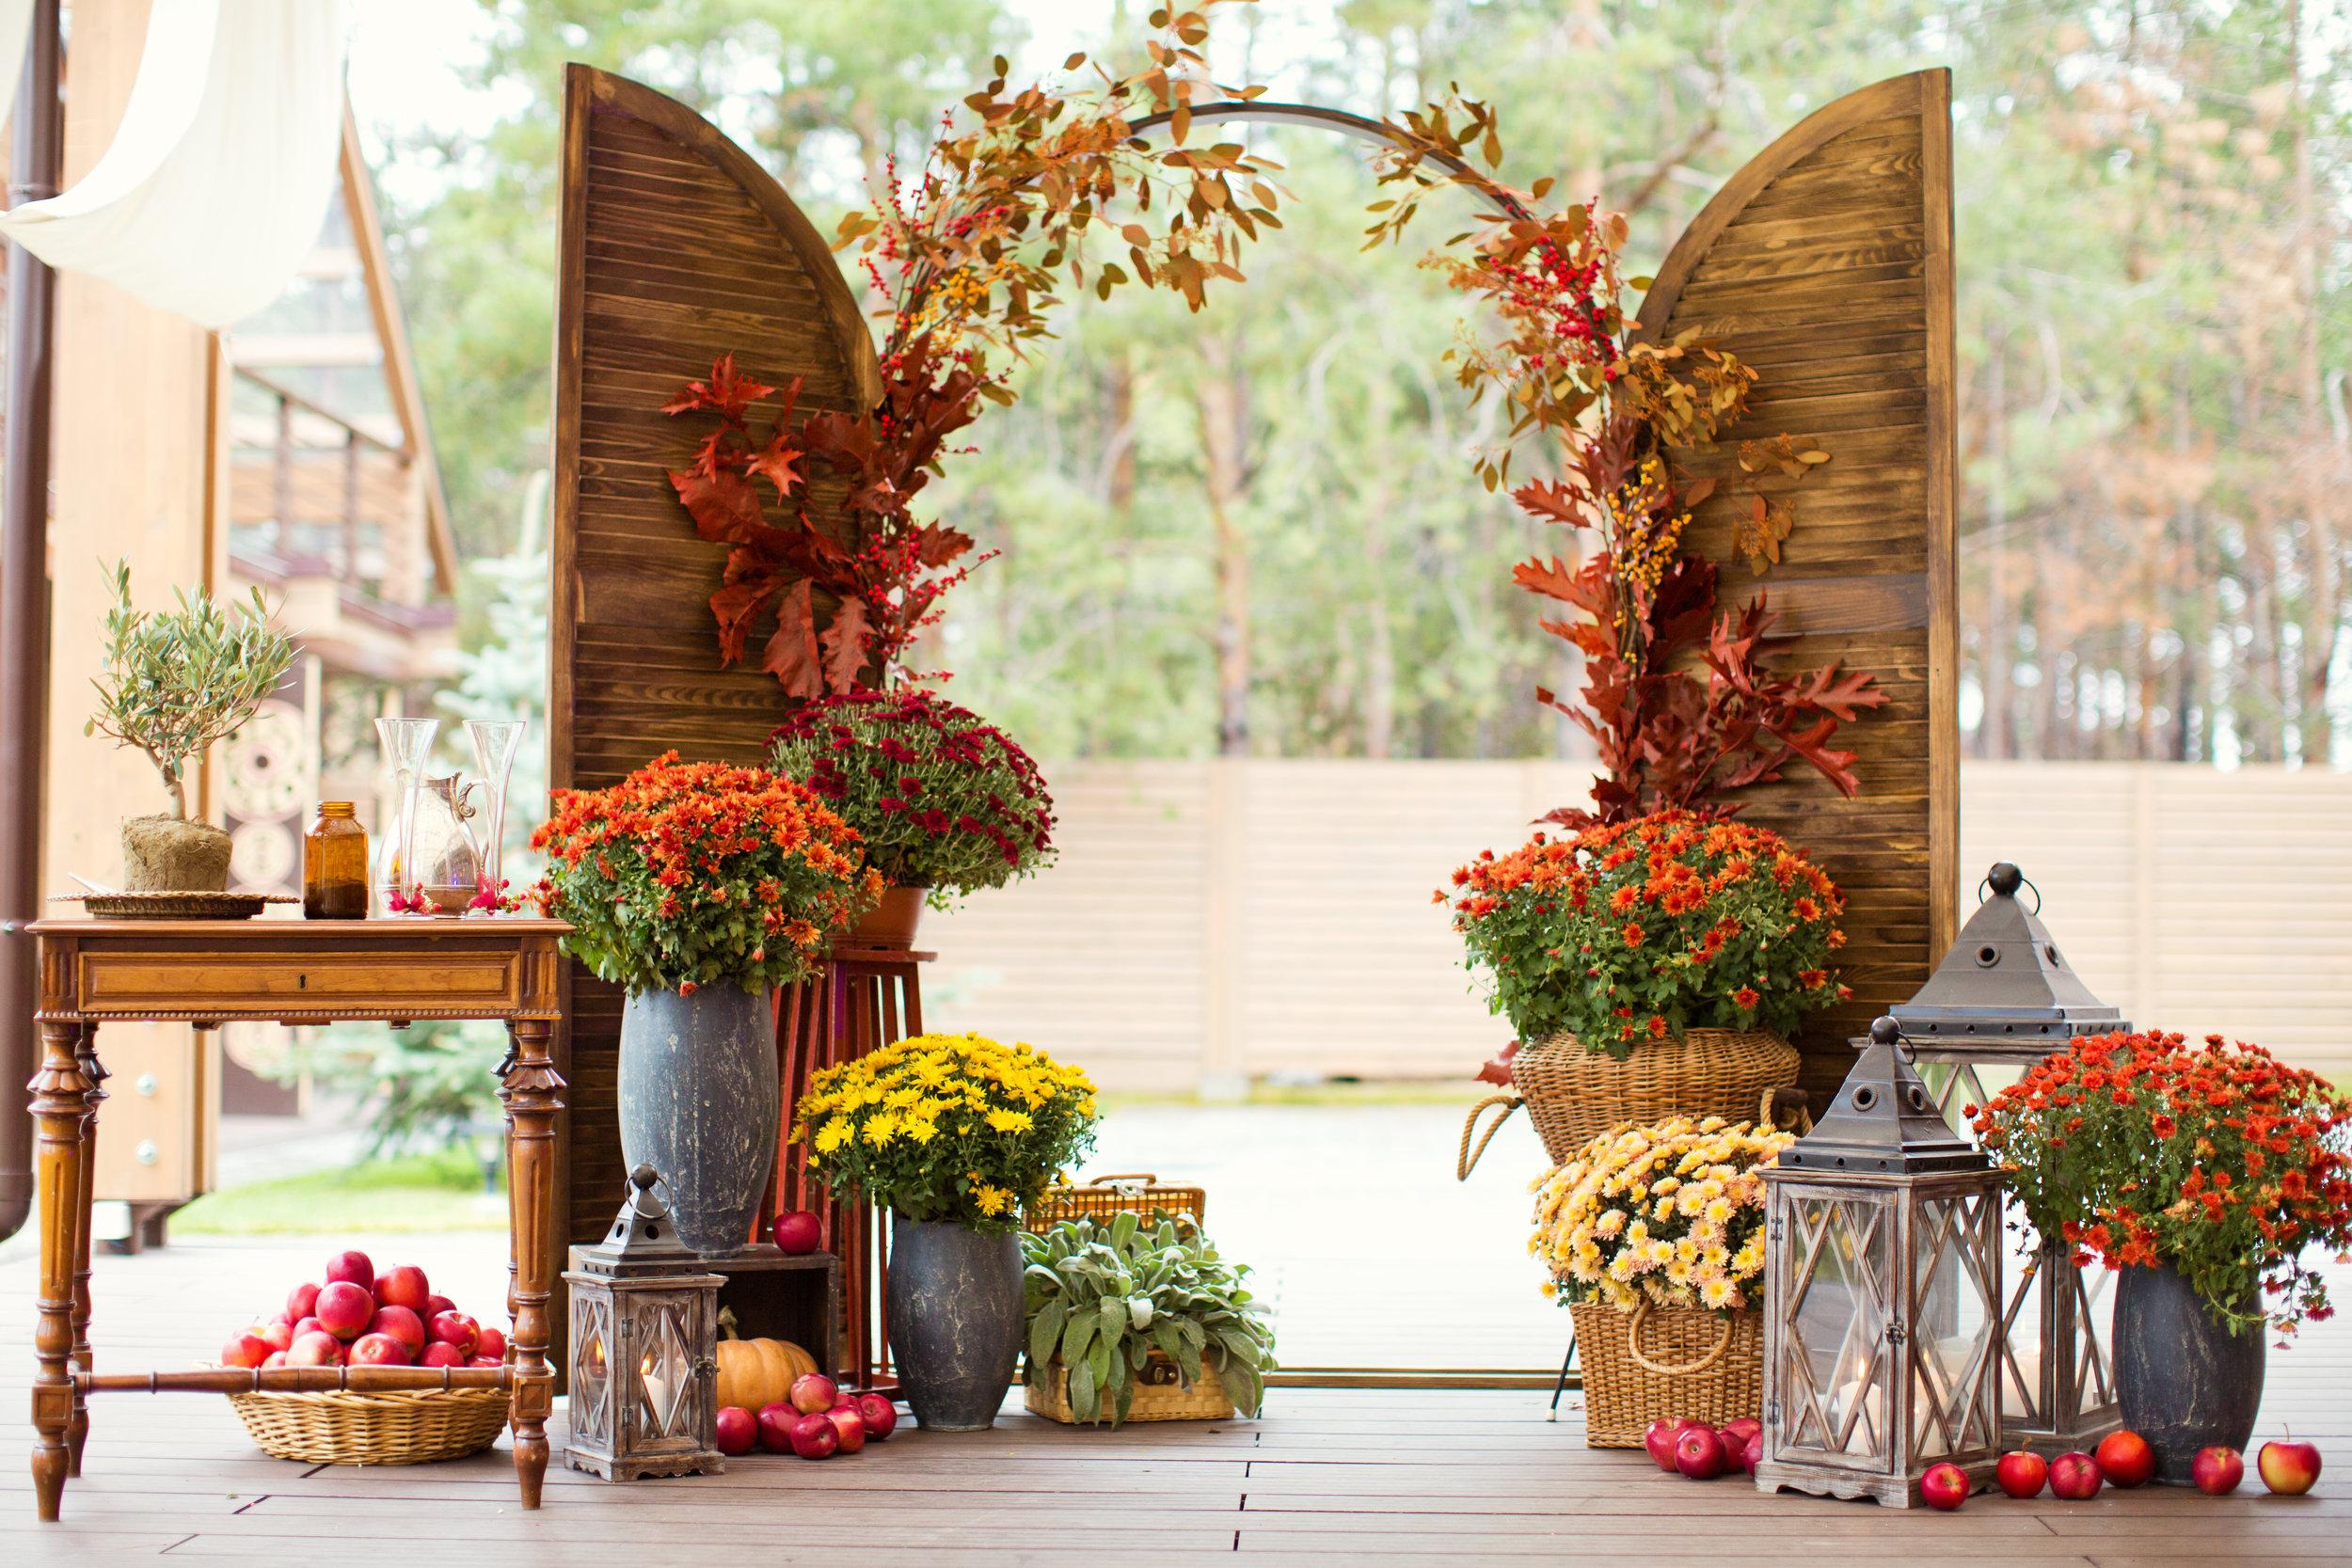 Vinewood_Decorations_Fall.jpg